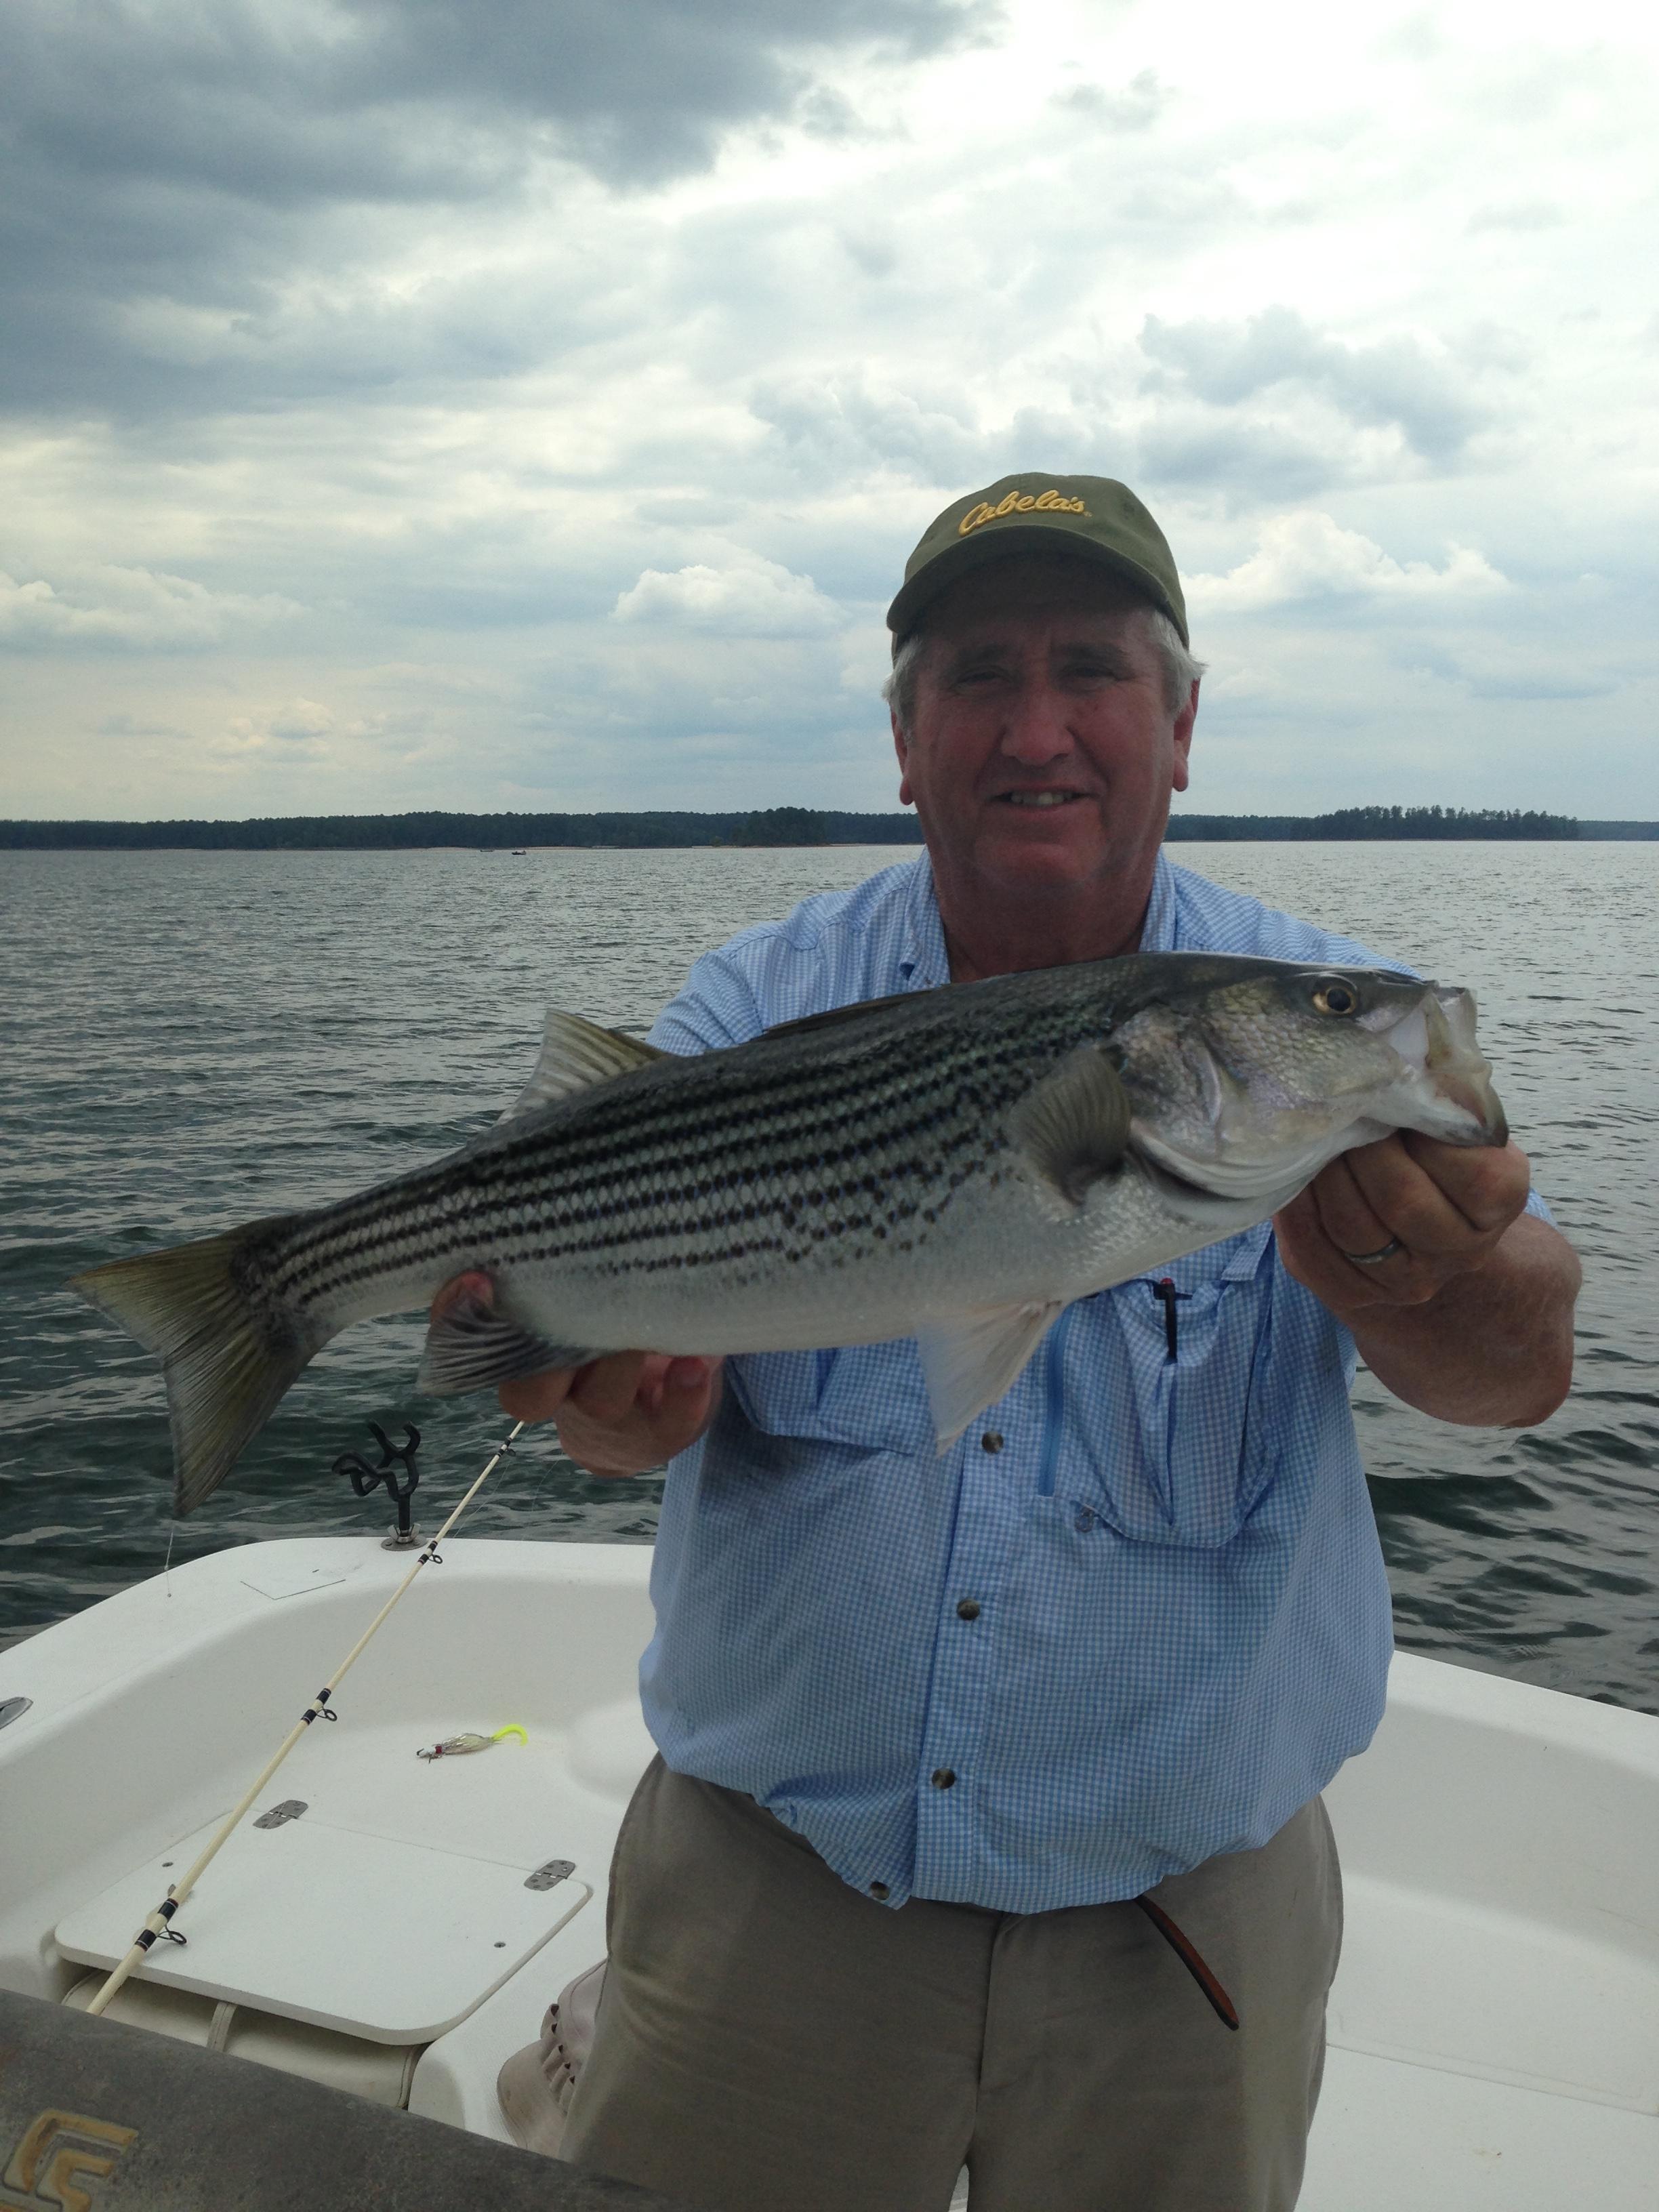 Glenn Smith from Albany, Ga. with 10 lb striper.